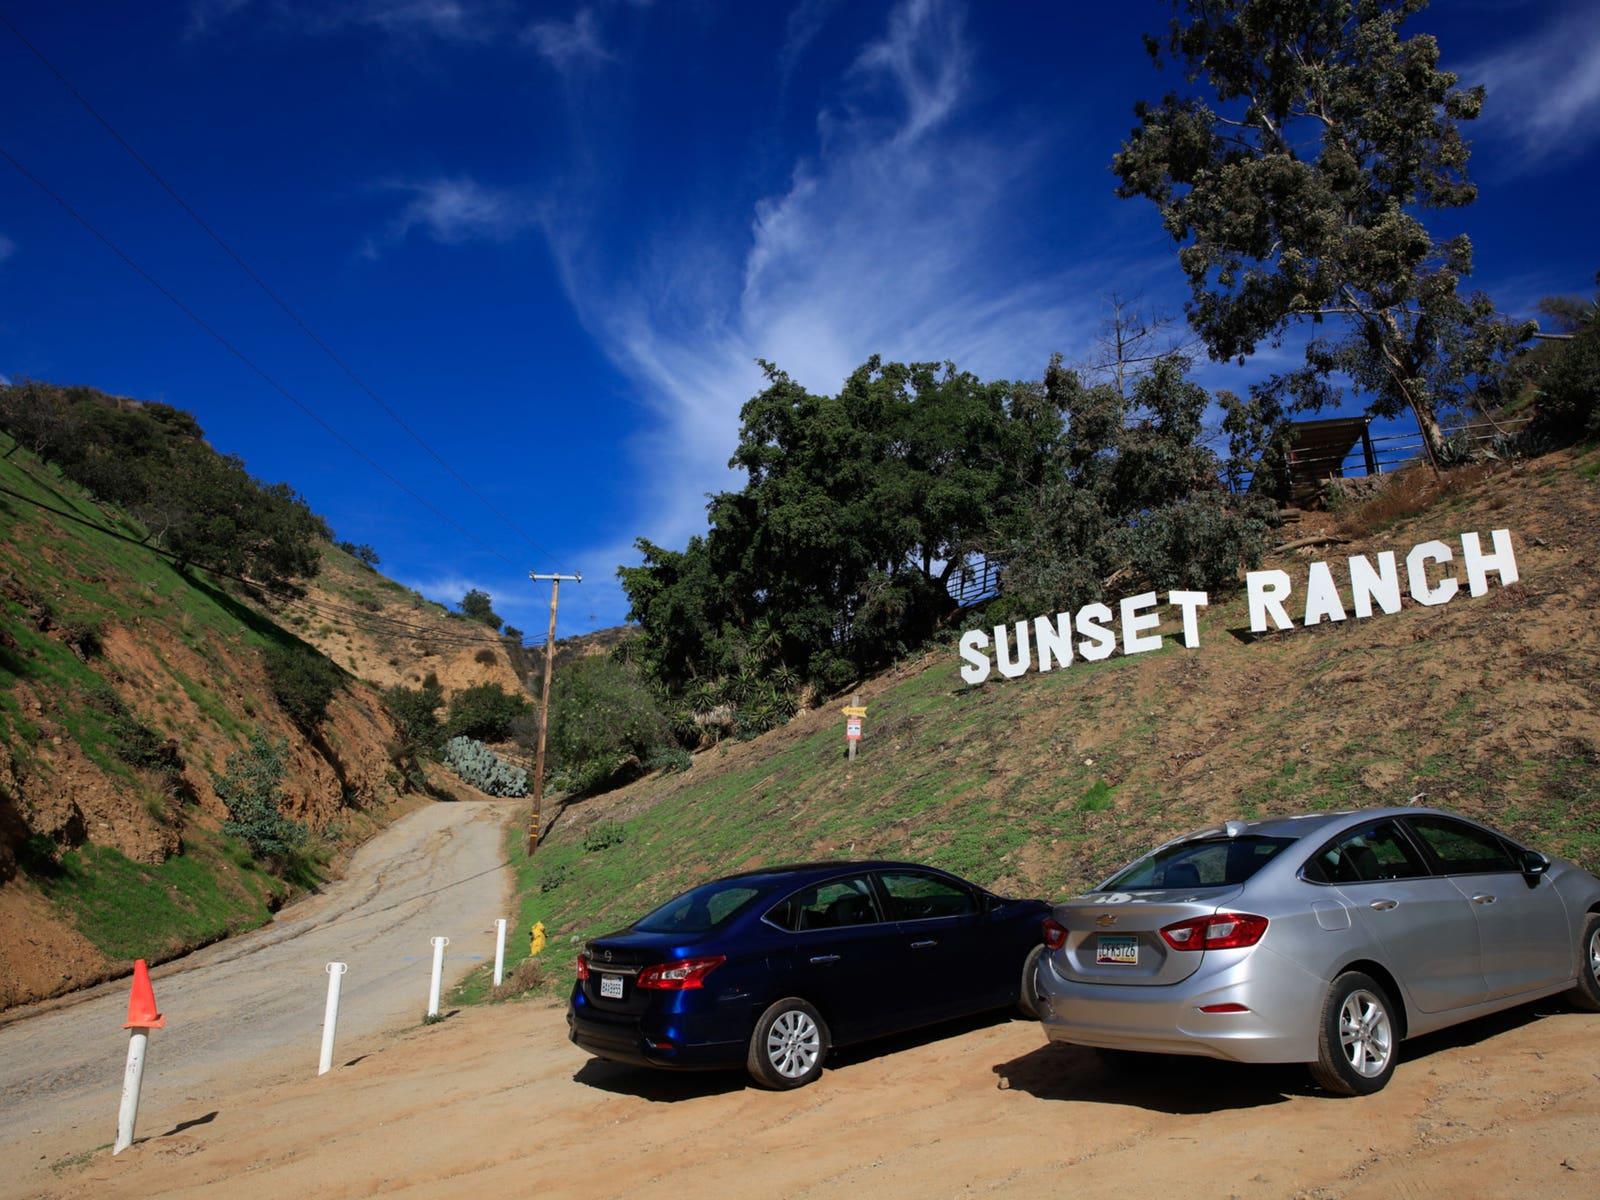 Sunset Ranch 1